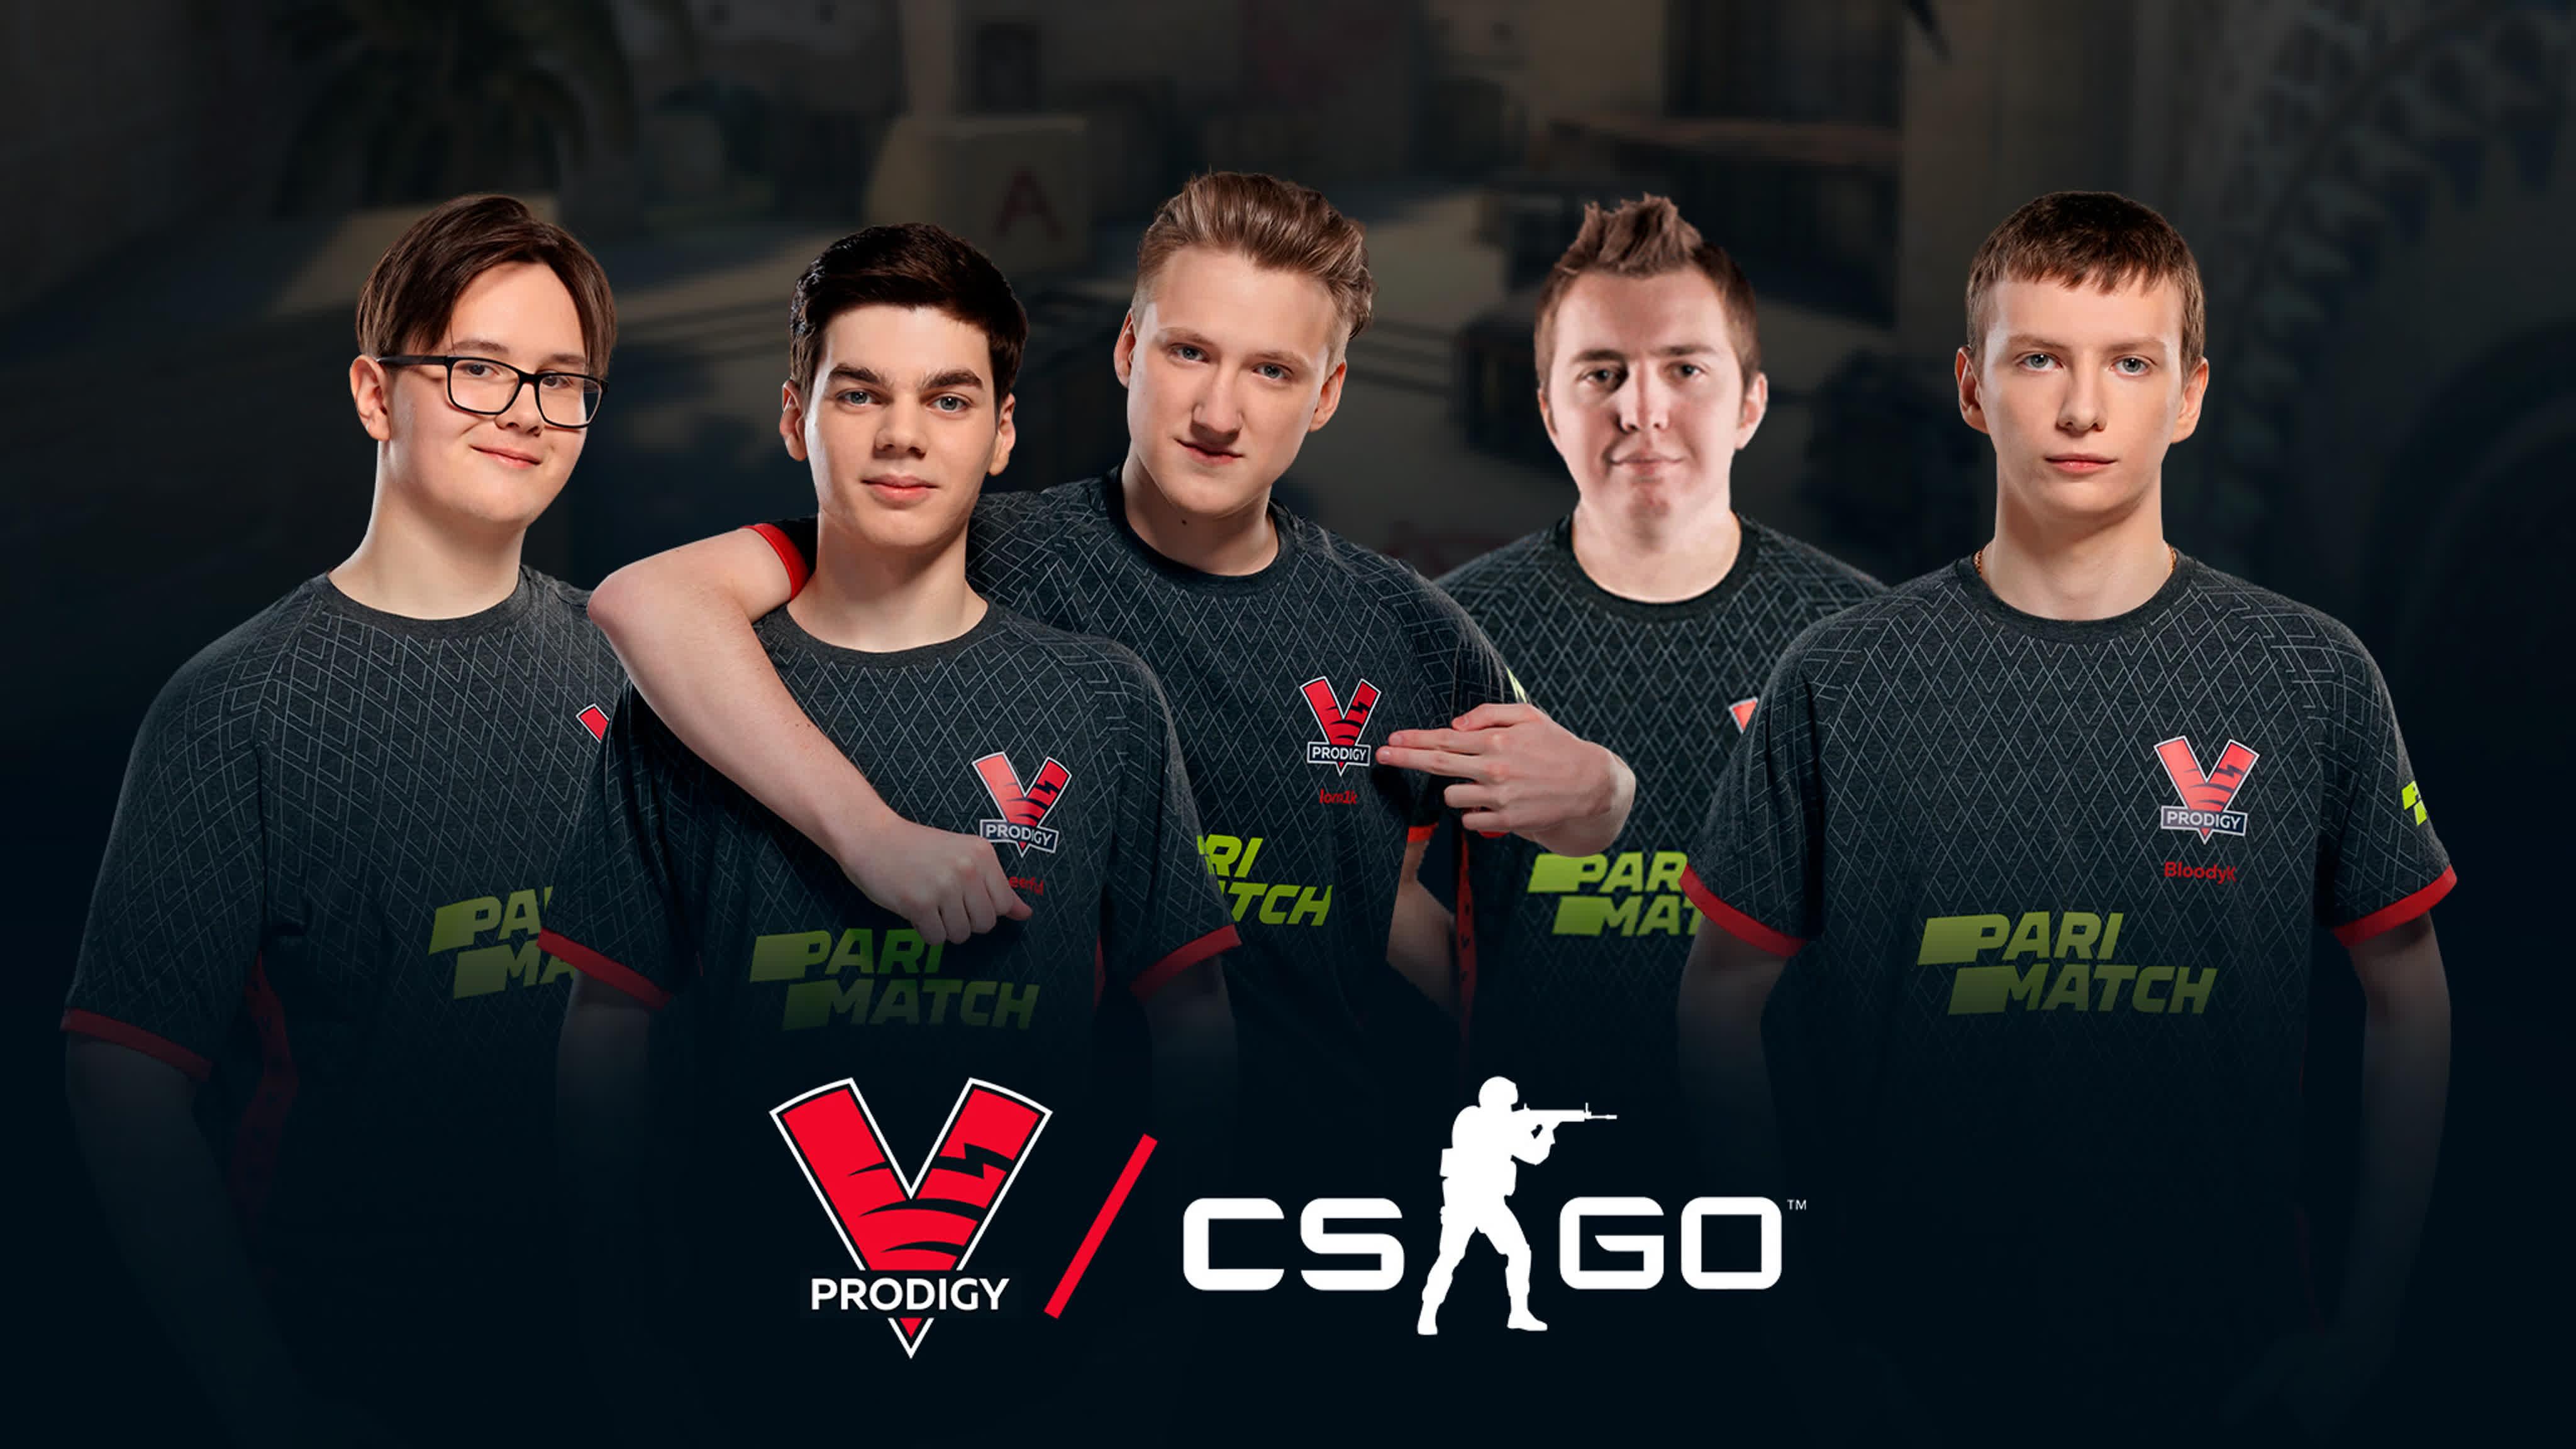 team profile vp.prodigy